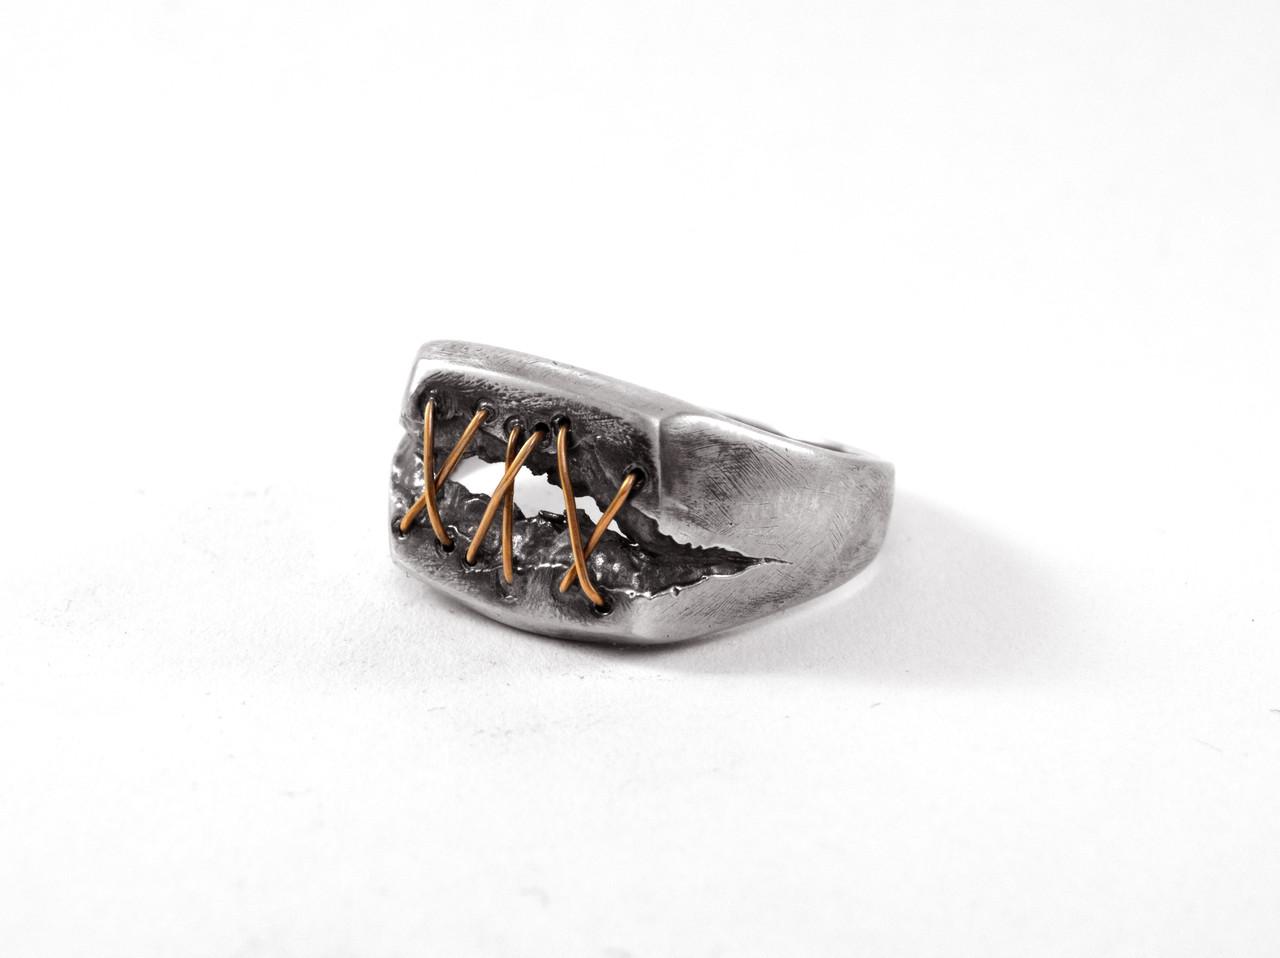 Кольцо из серебра EJ Dr. Lecter Размер 22.5